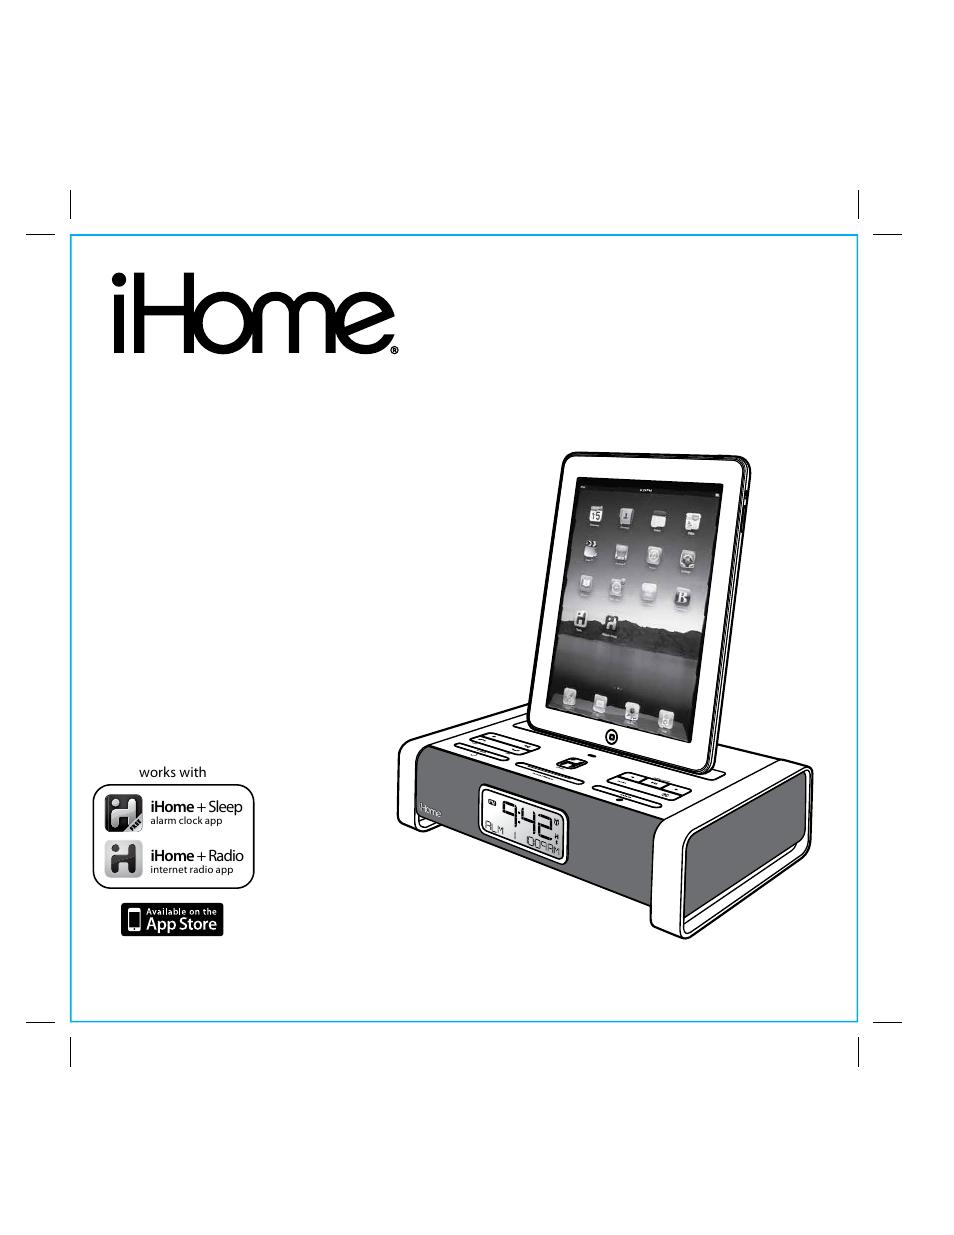 ihome ia100 user manual 17 pages rh manualsdir com iHome Mouse Manual iHome Audio